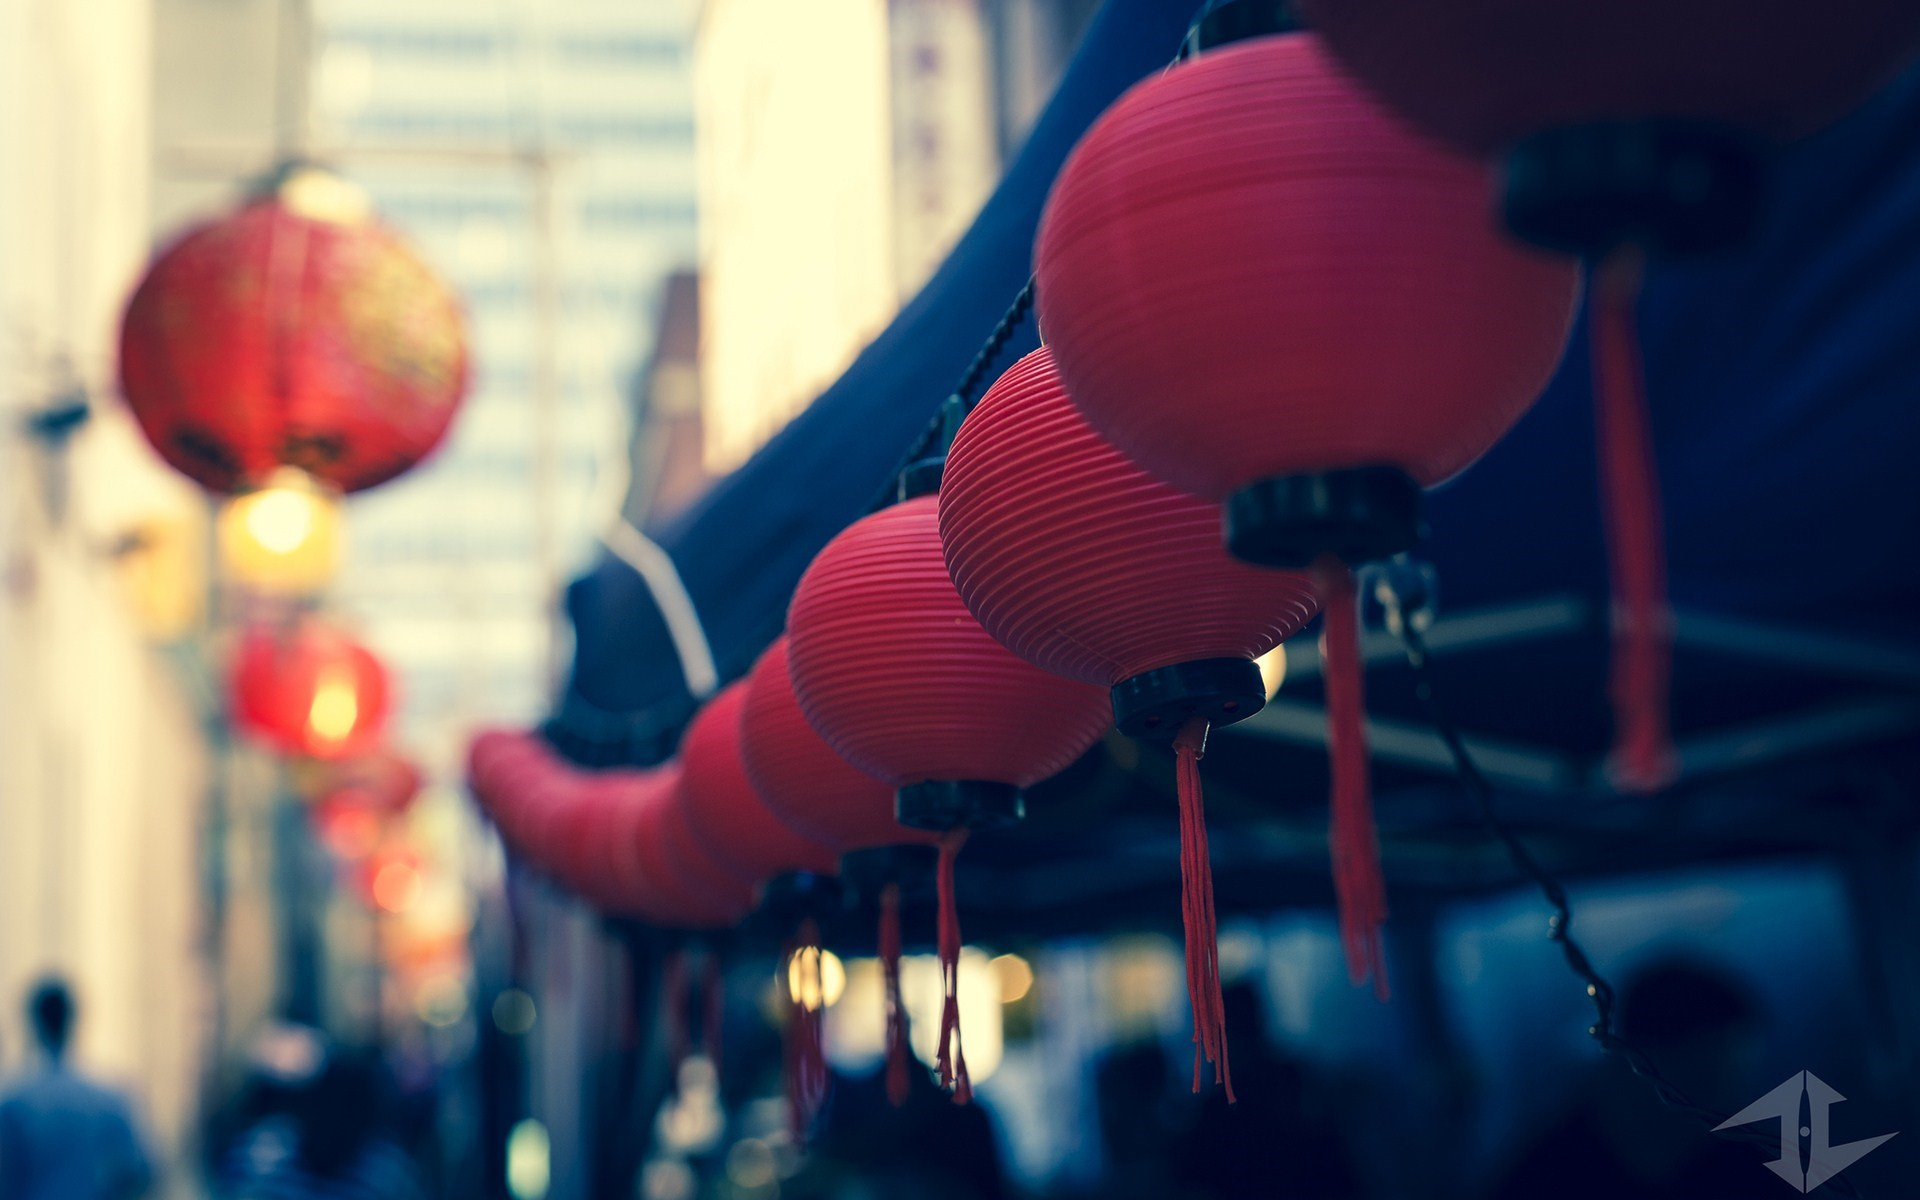 Red Christmas Lanterns